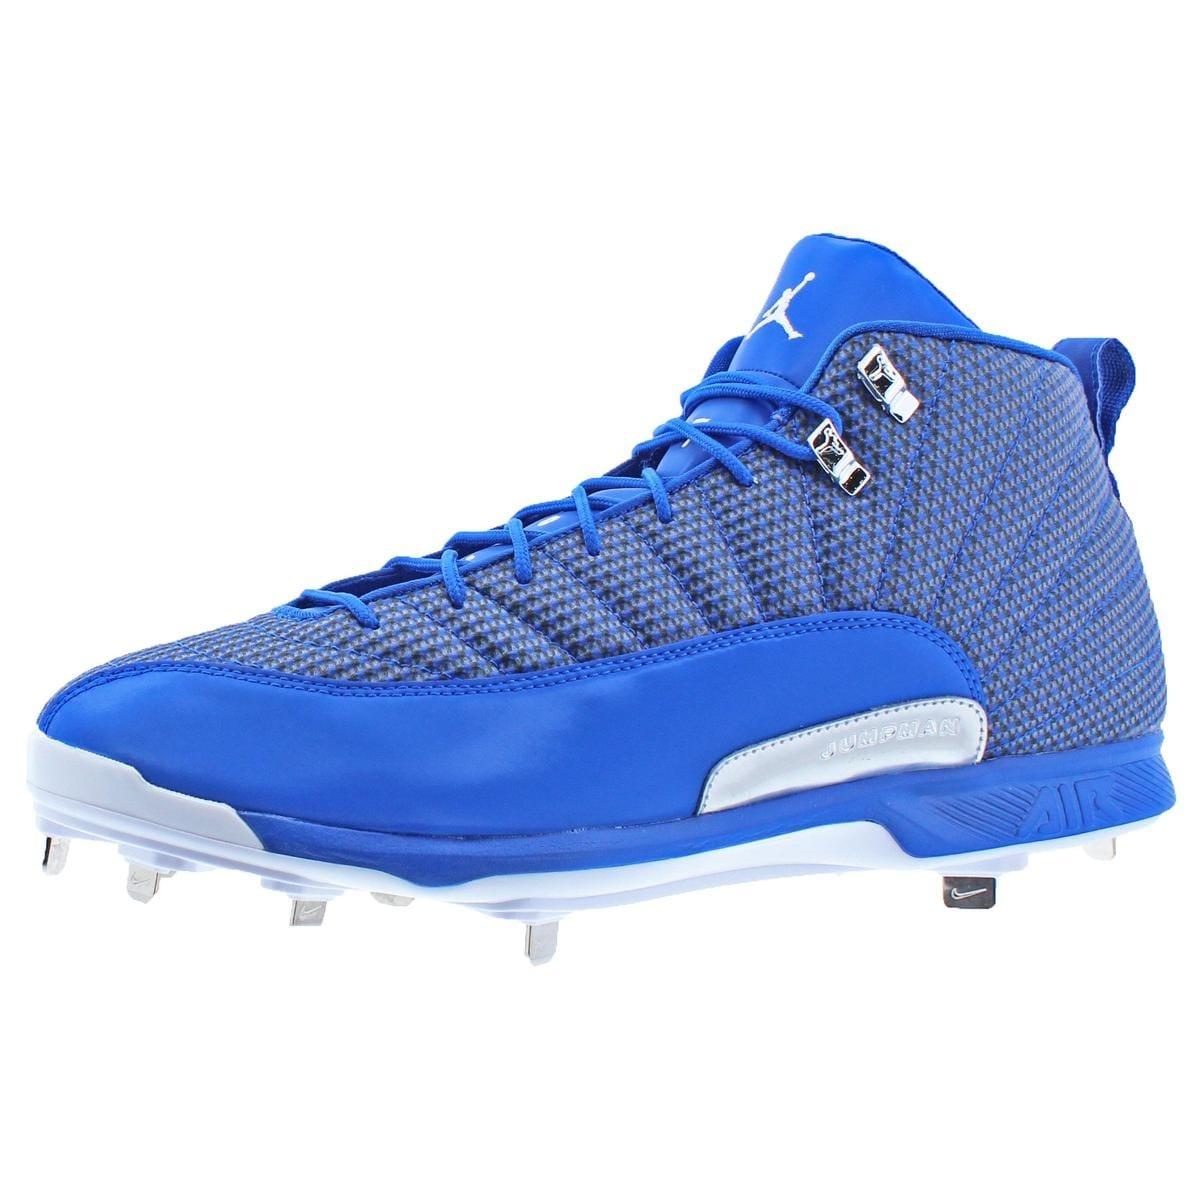 8e7a4fb78ce0b7 Blue Jordan Men s Shoes